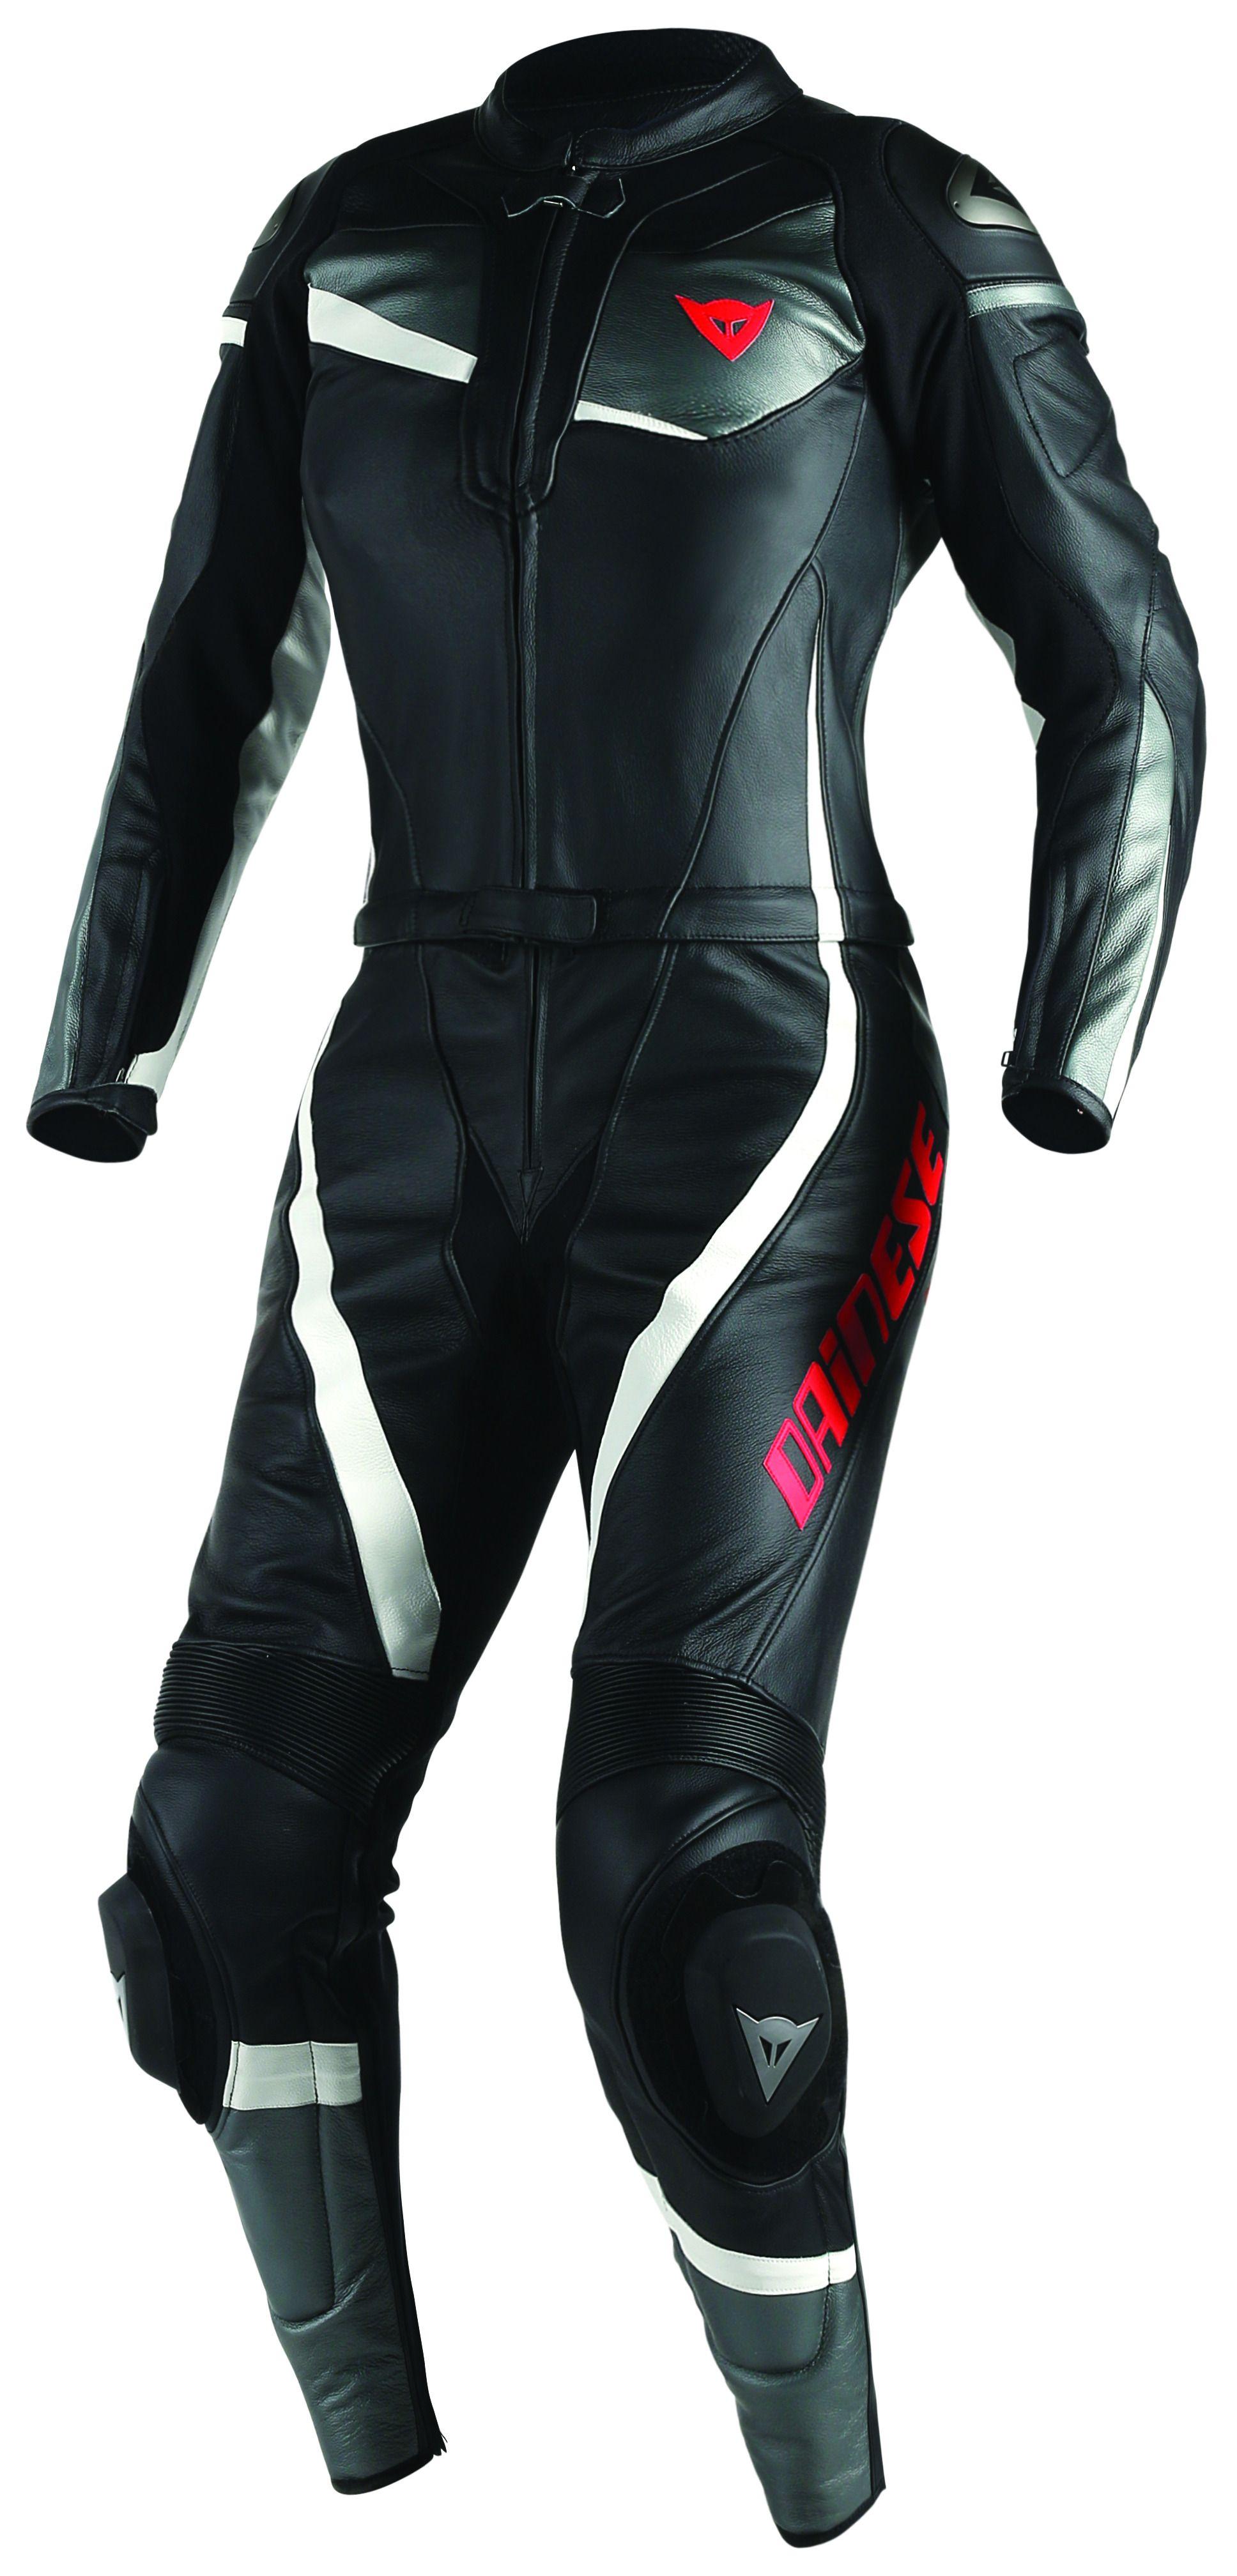 Dainese Veloster Two Piece Women's Race Suit - (Sz 48 Only) | 30% ($299.98)  Off! Biker GearMotorcycle ...